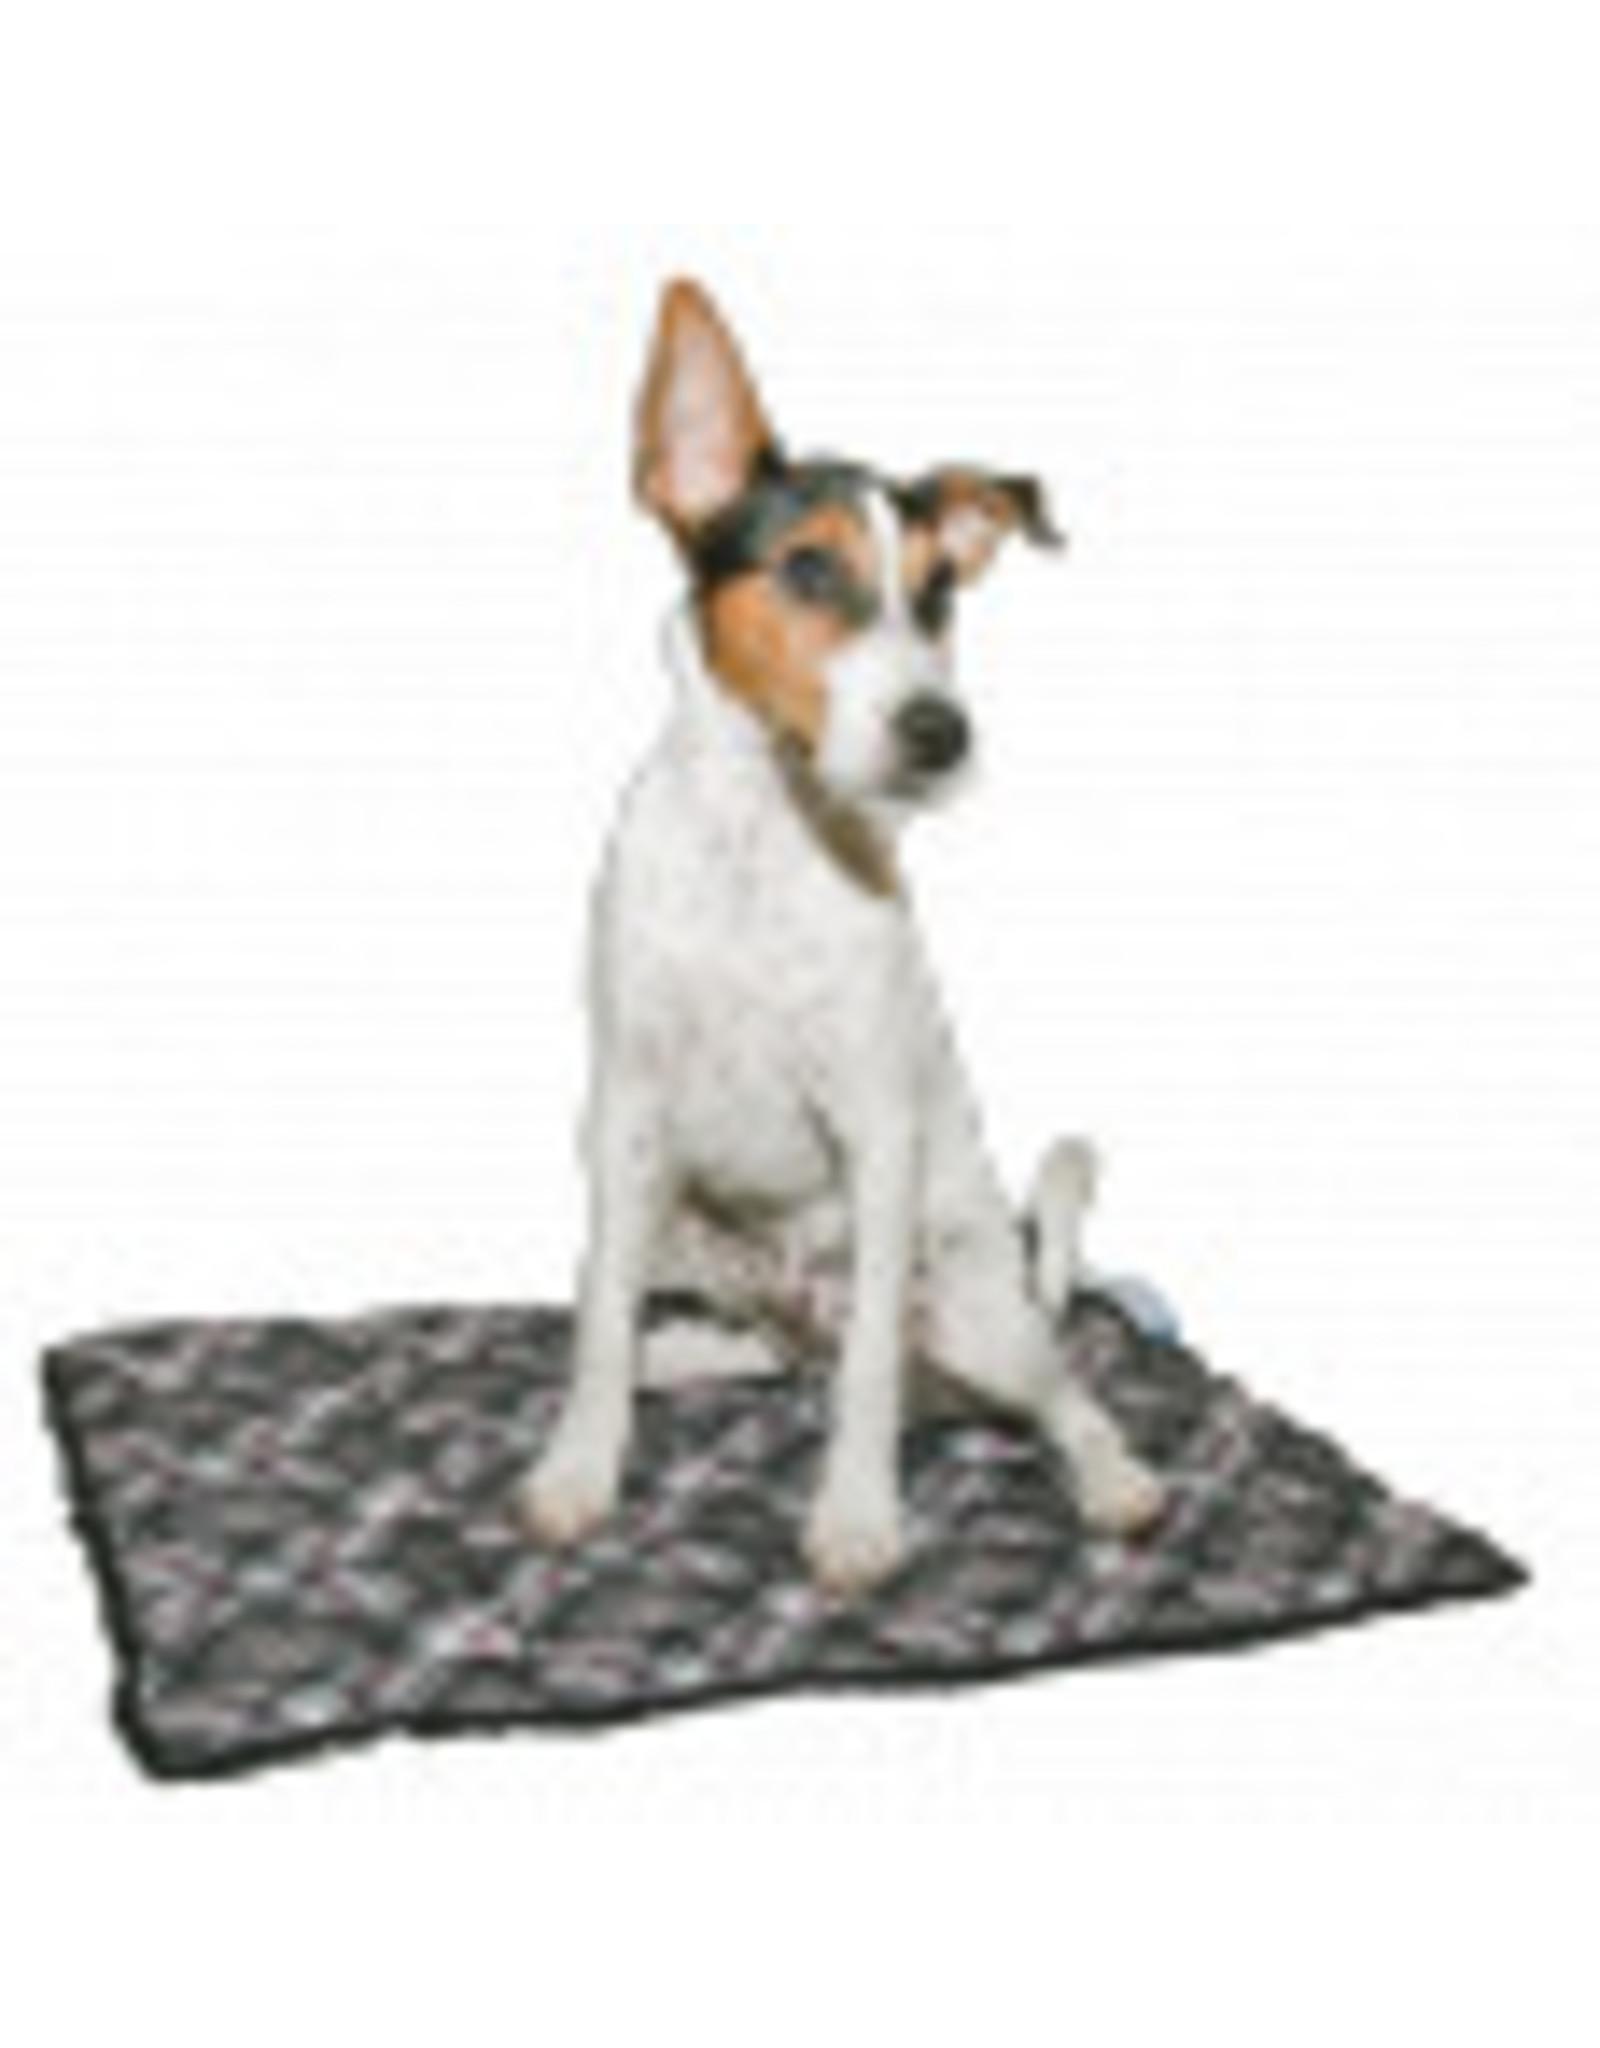 Doxtasy/Animal Gear Animal Gear Aqua Coolkeeper Cooling Mat